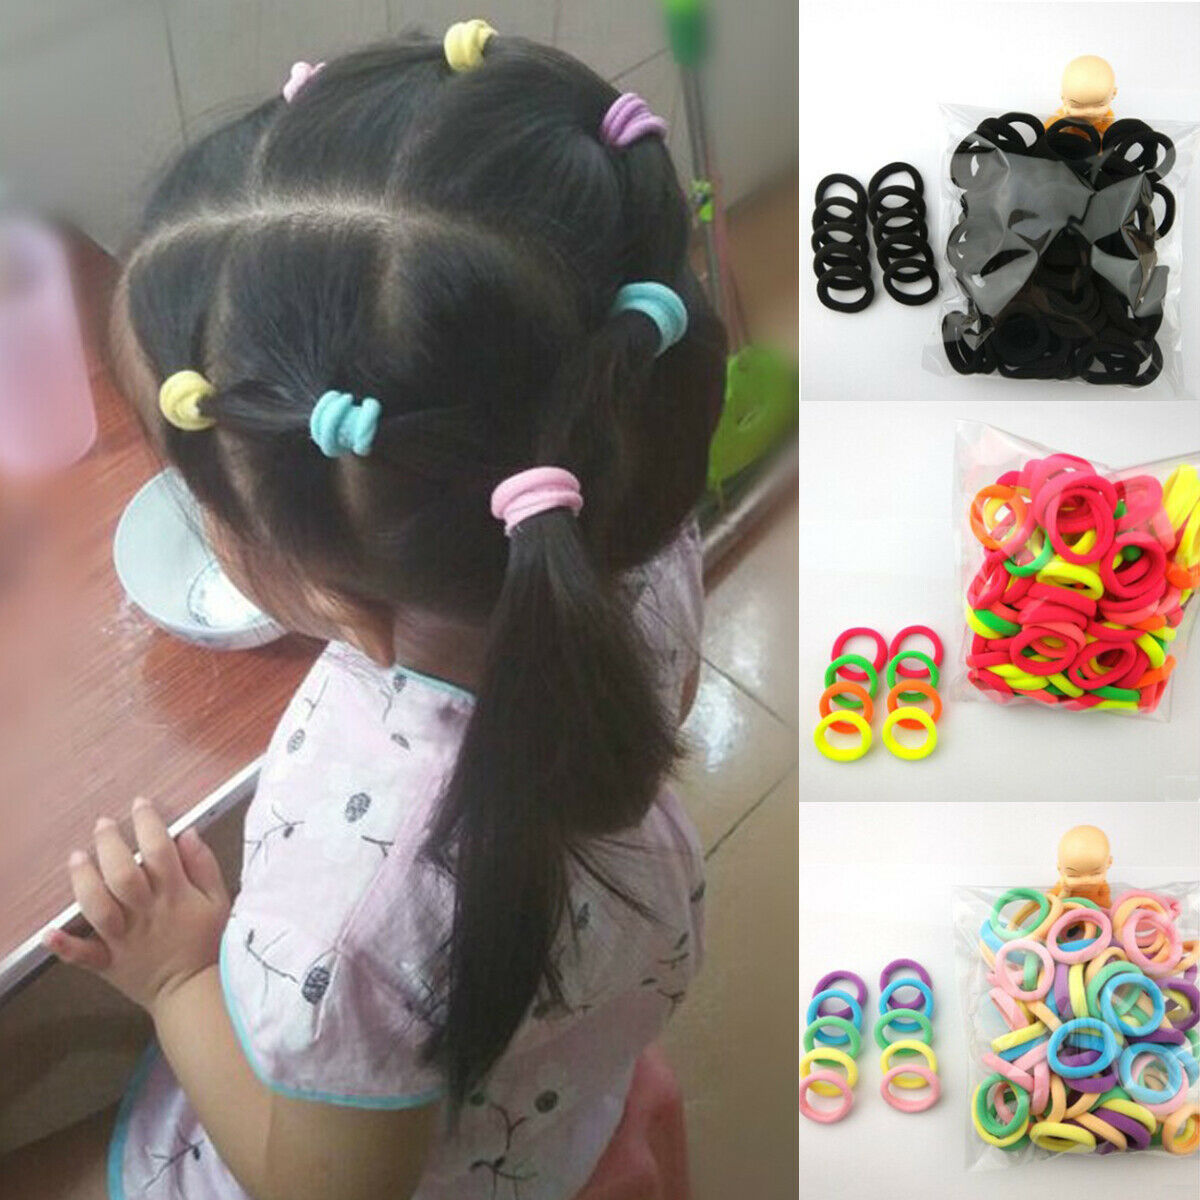 50 Pcs Assorted Elastic Rubber Hair Rope Band Ponytail Holder for Kids Girl